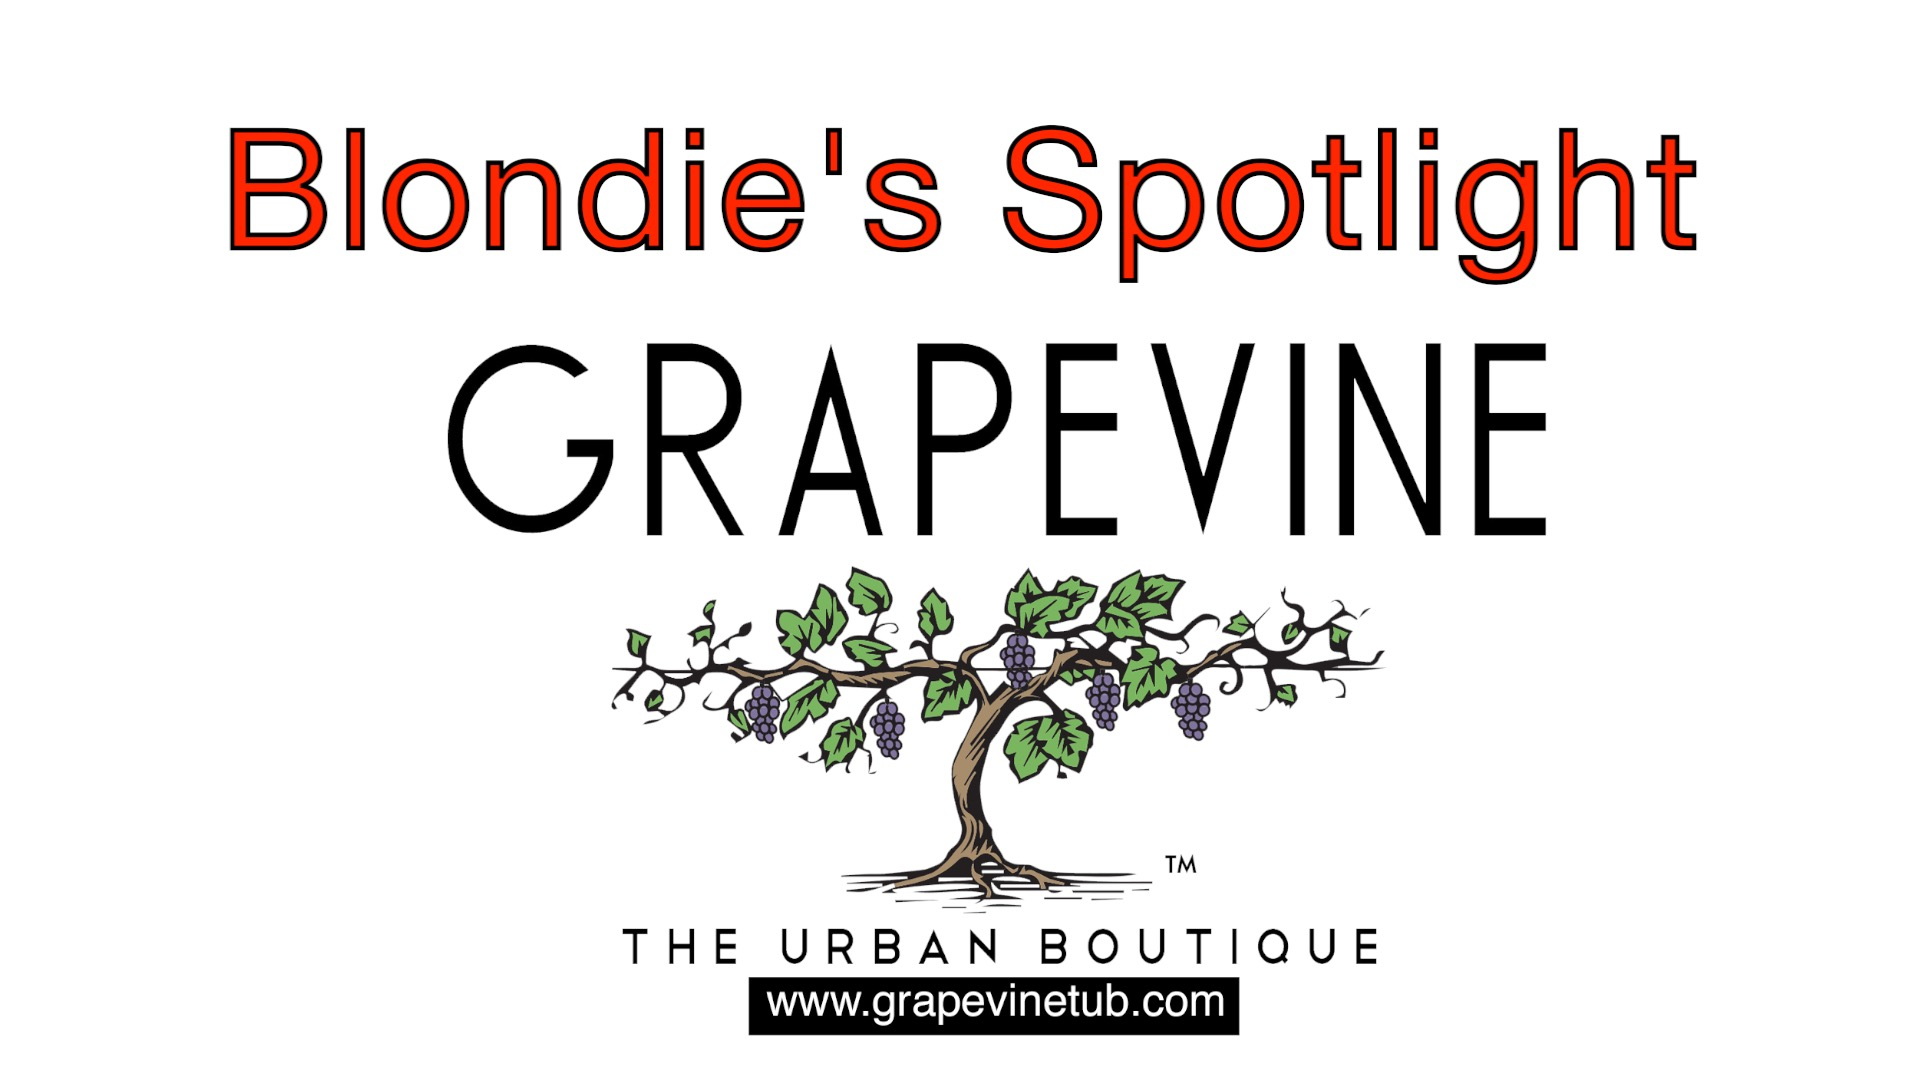 Blondie's Spotlight: Grapevine The Urban Boutique